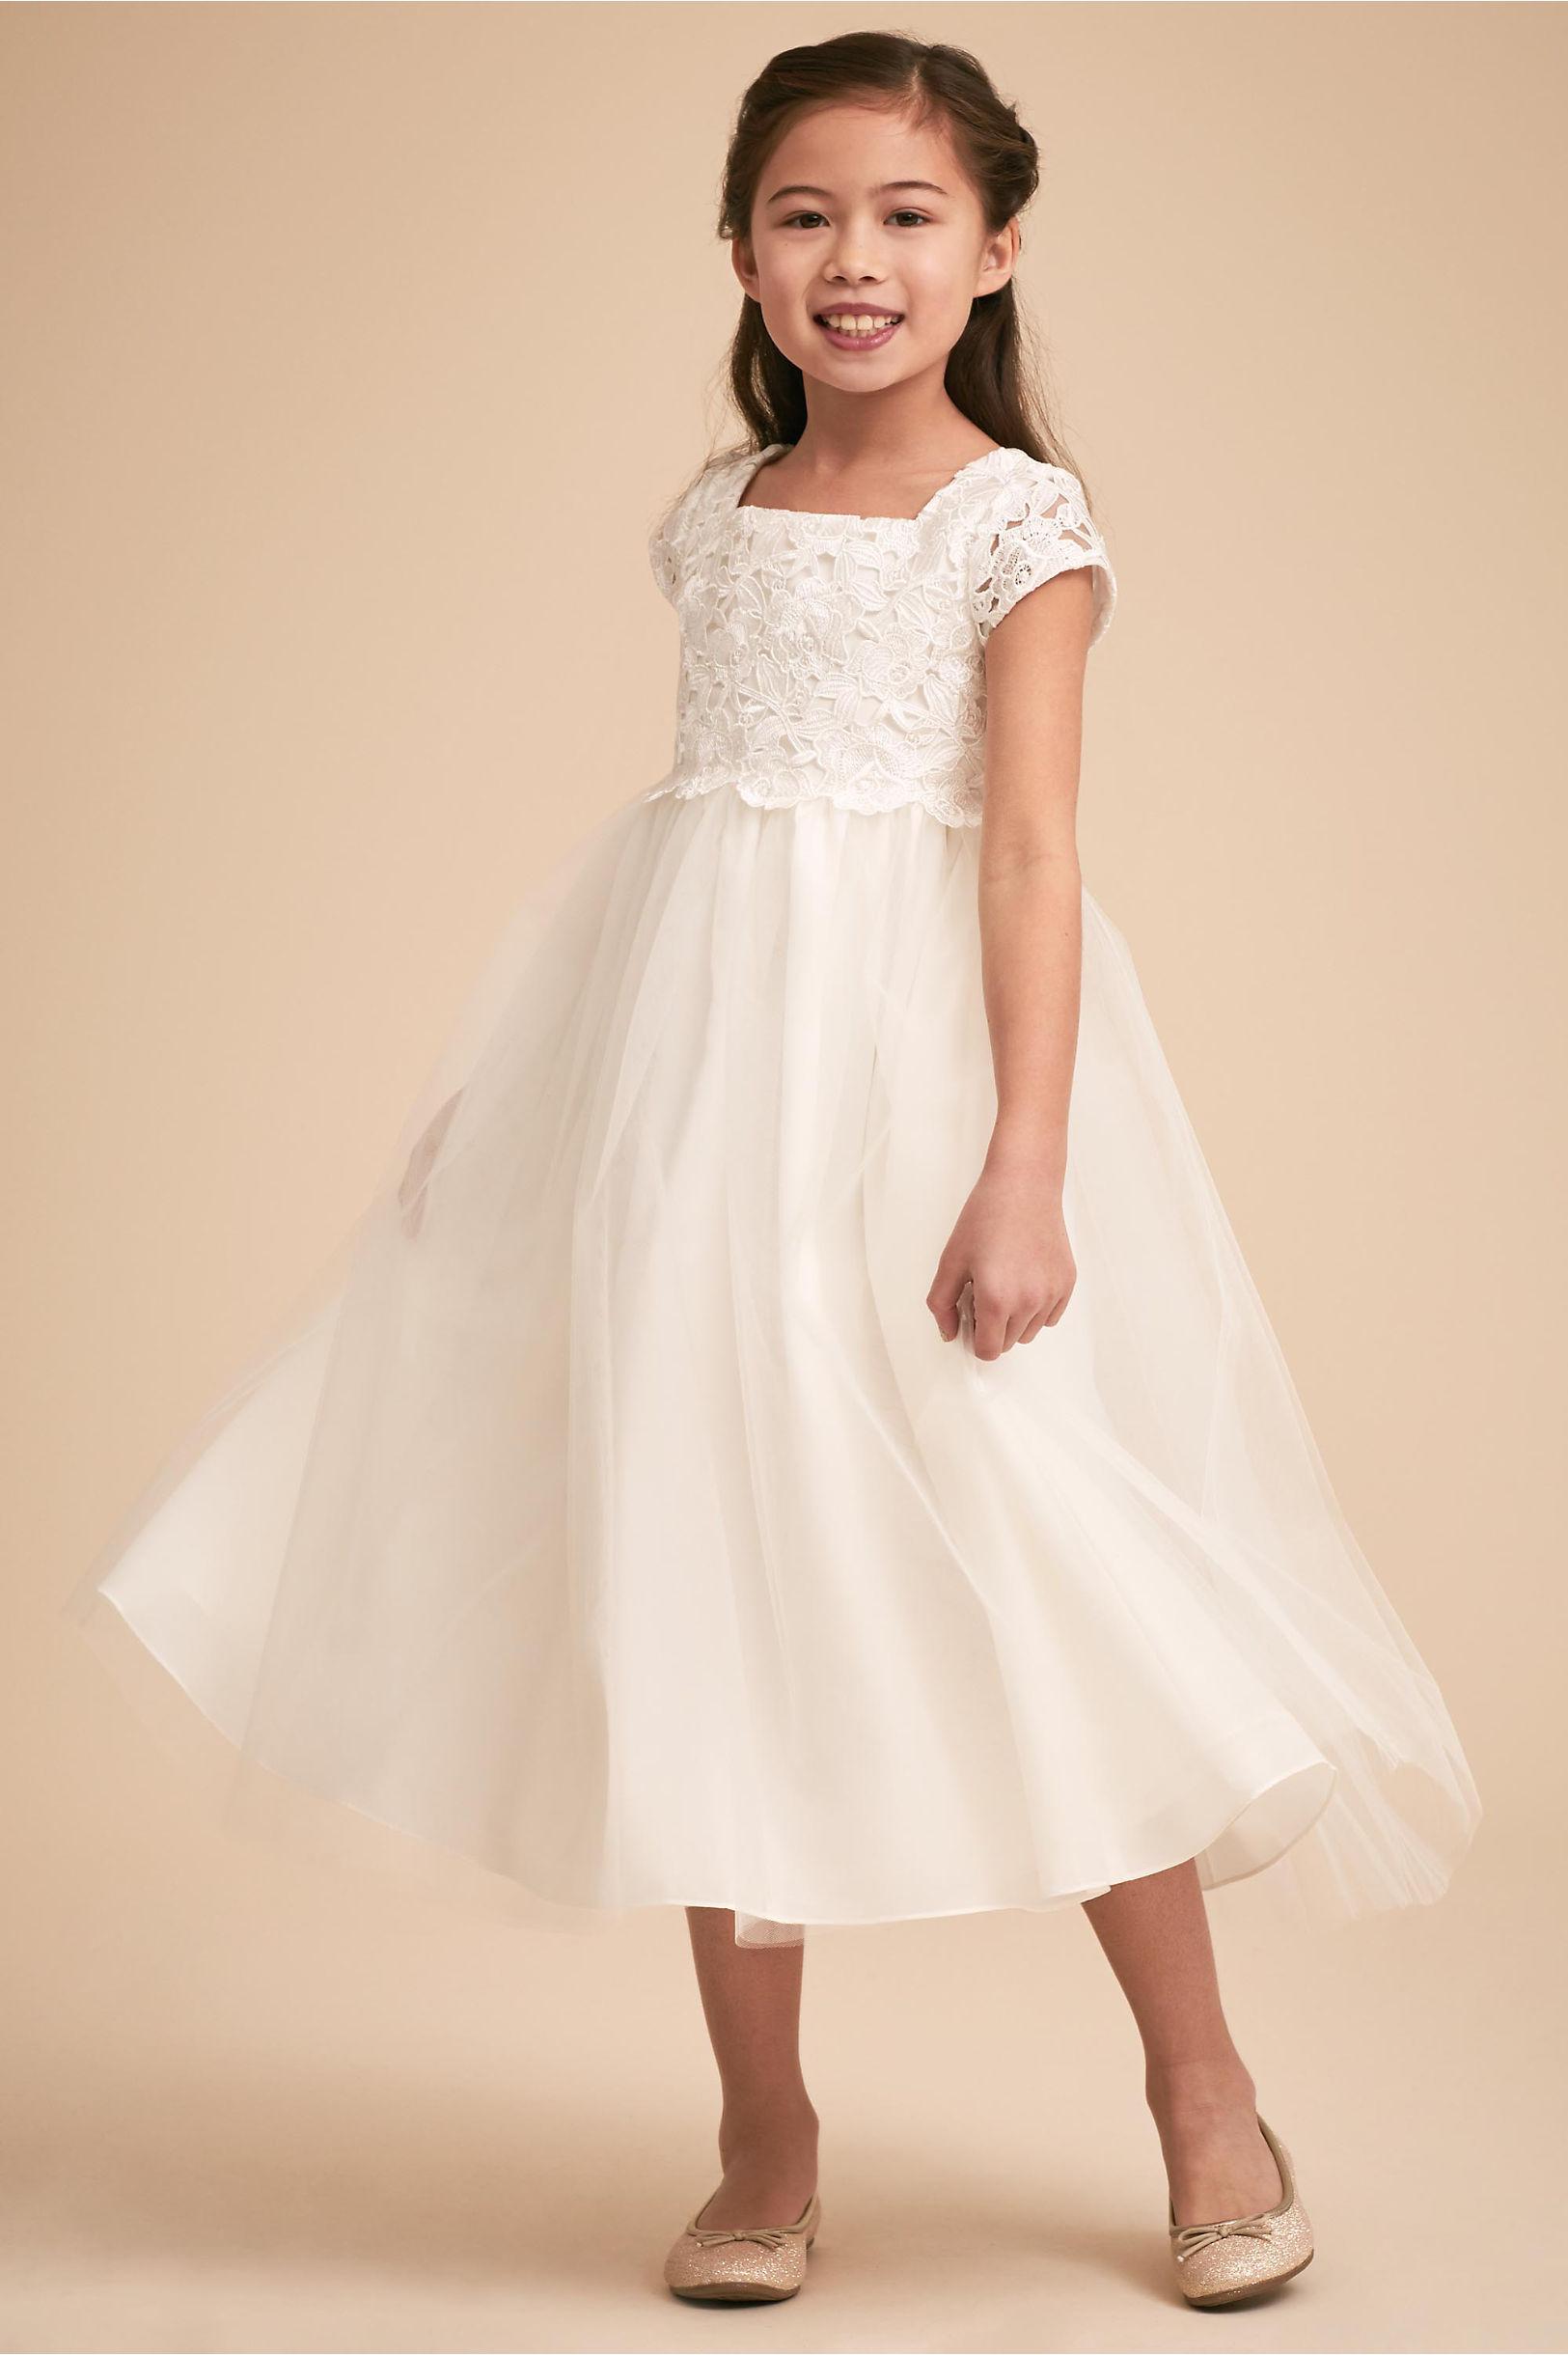 Flower girl dresses junior bridesmaid dresses bhldn camille dress ombrellifo Choice Image